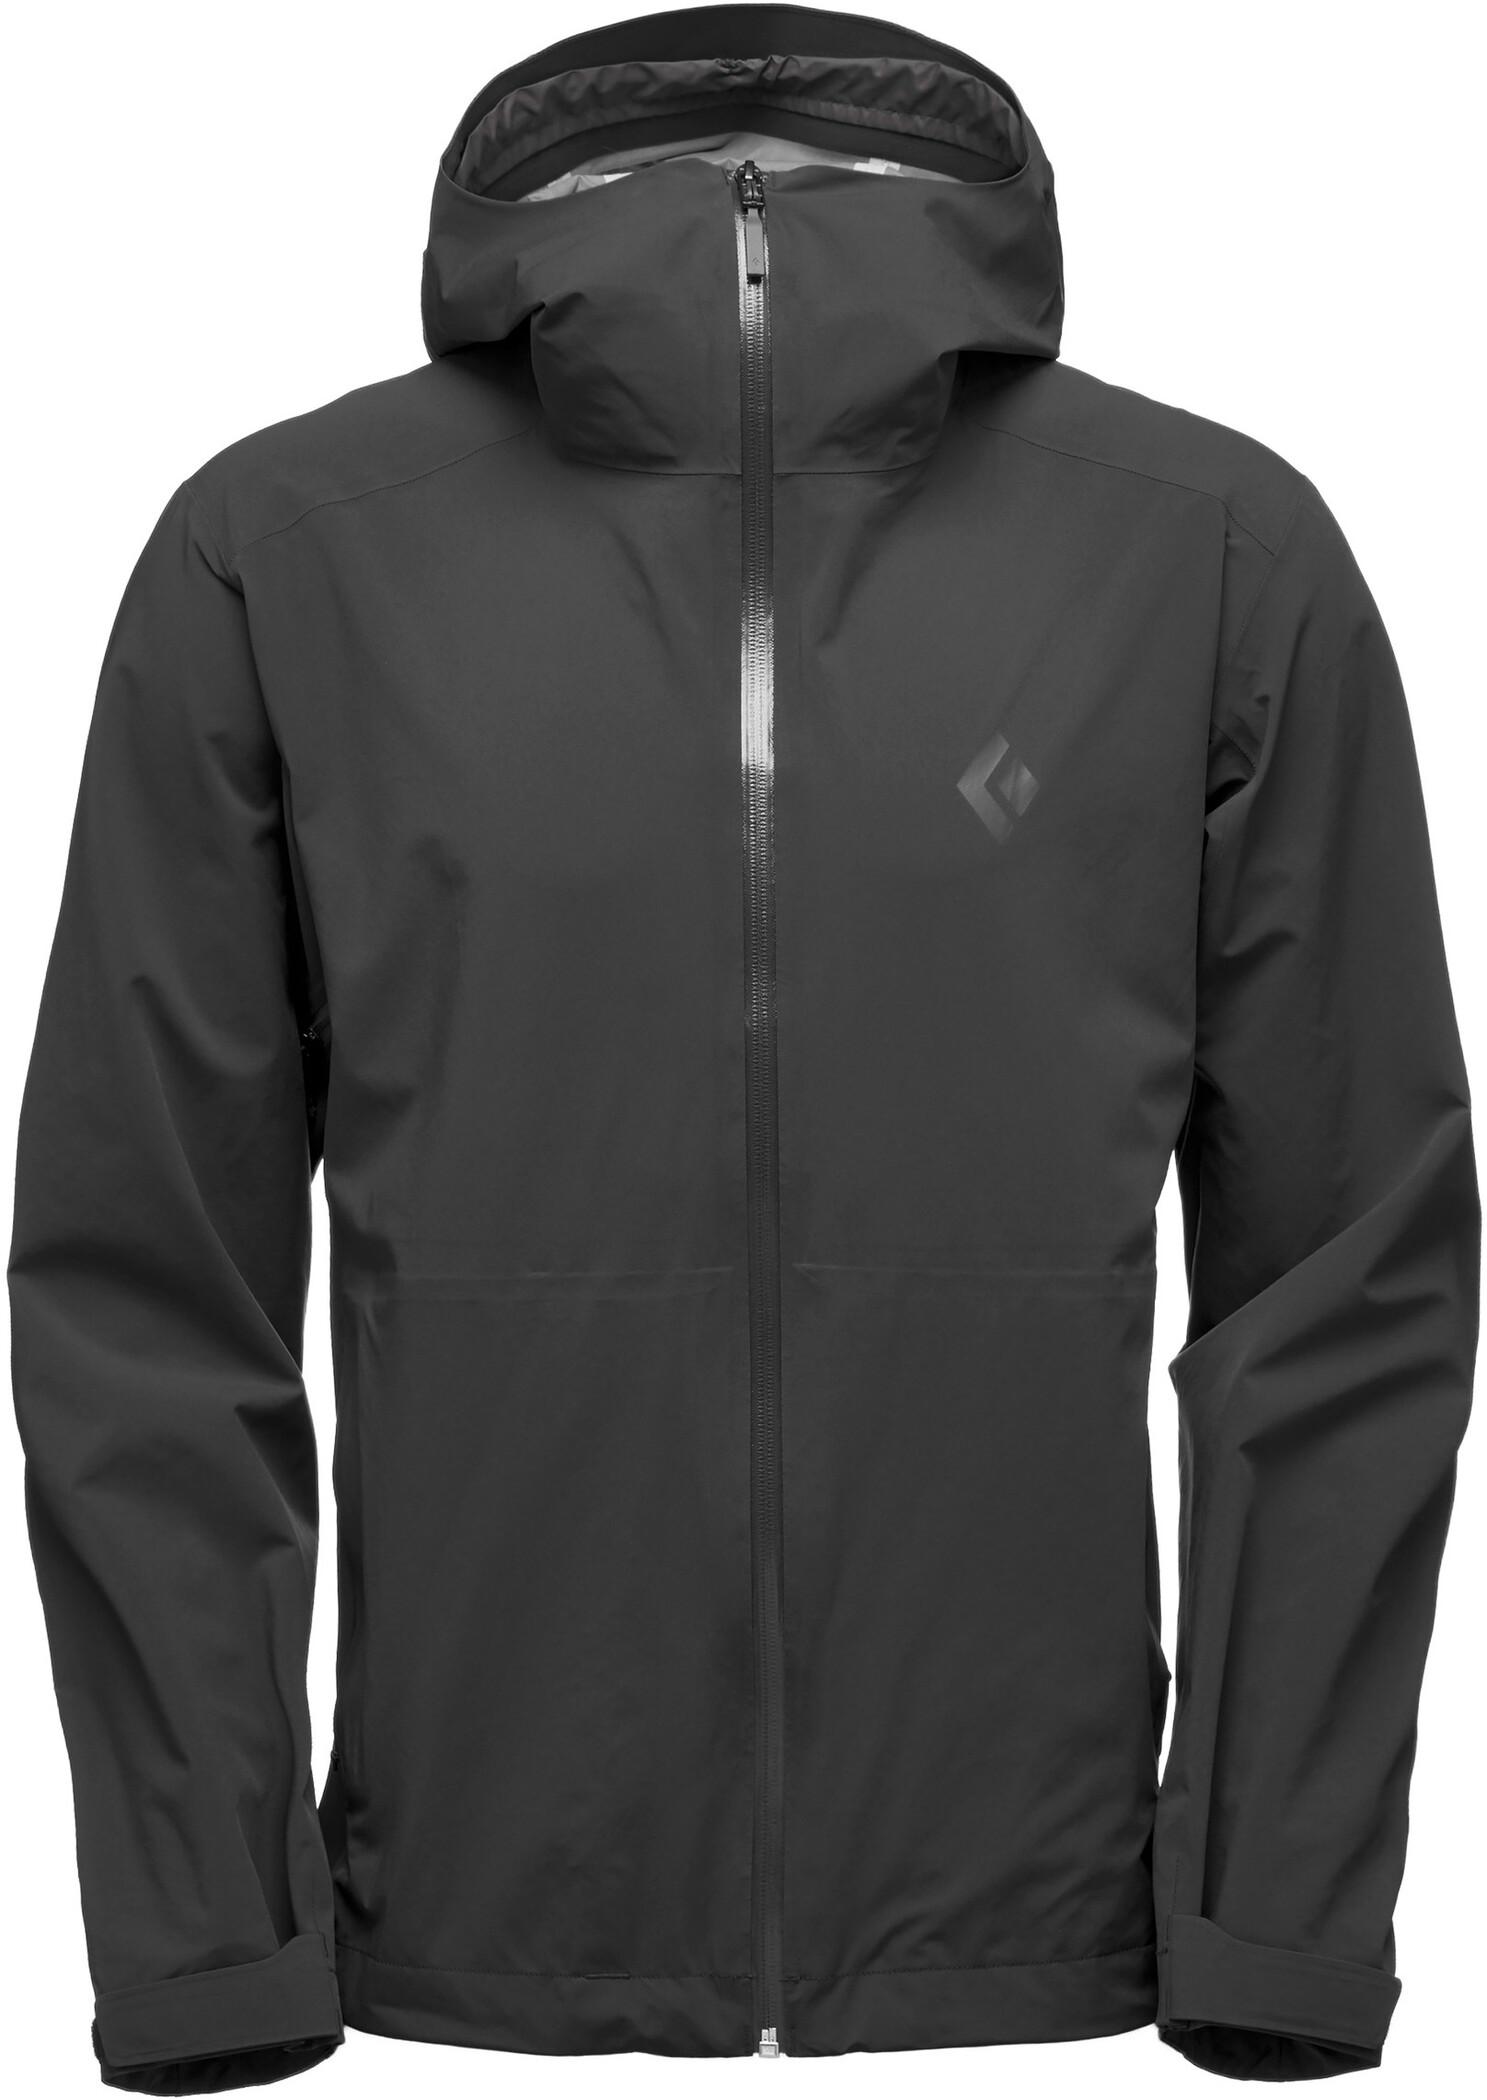 Mons Royale Redwood Wind Jacket (Herr) Hitta bästa pris på